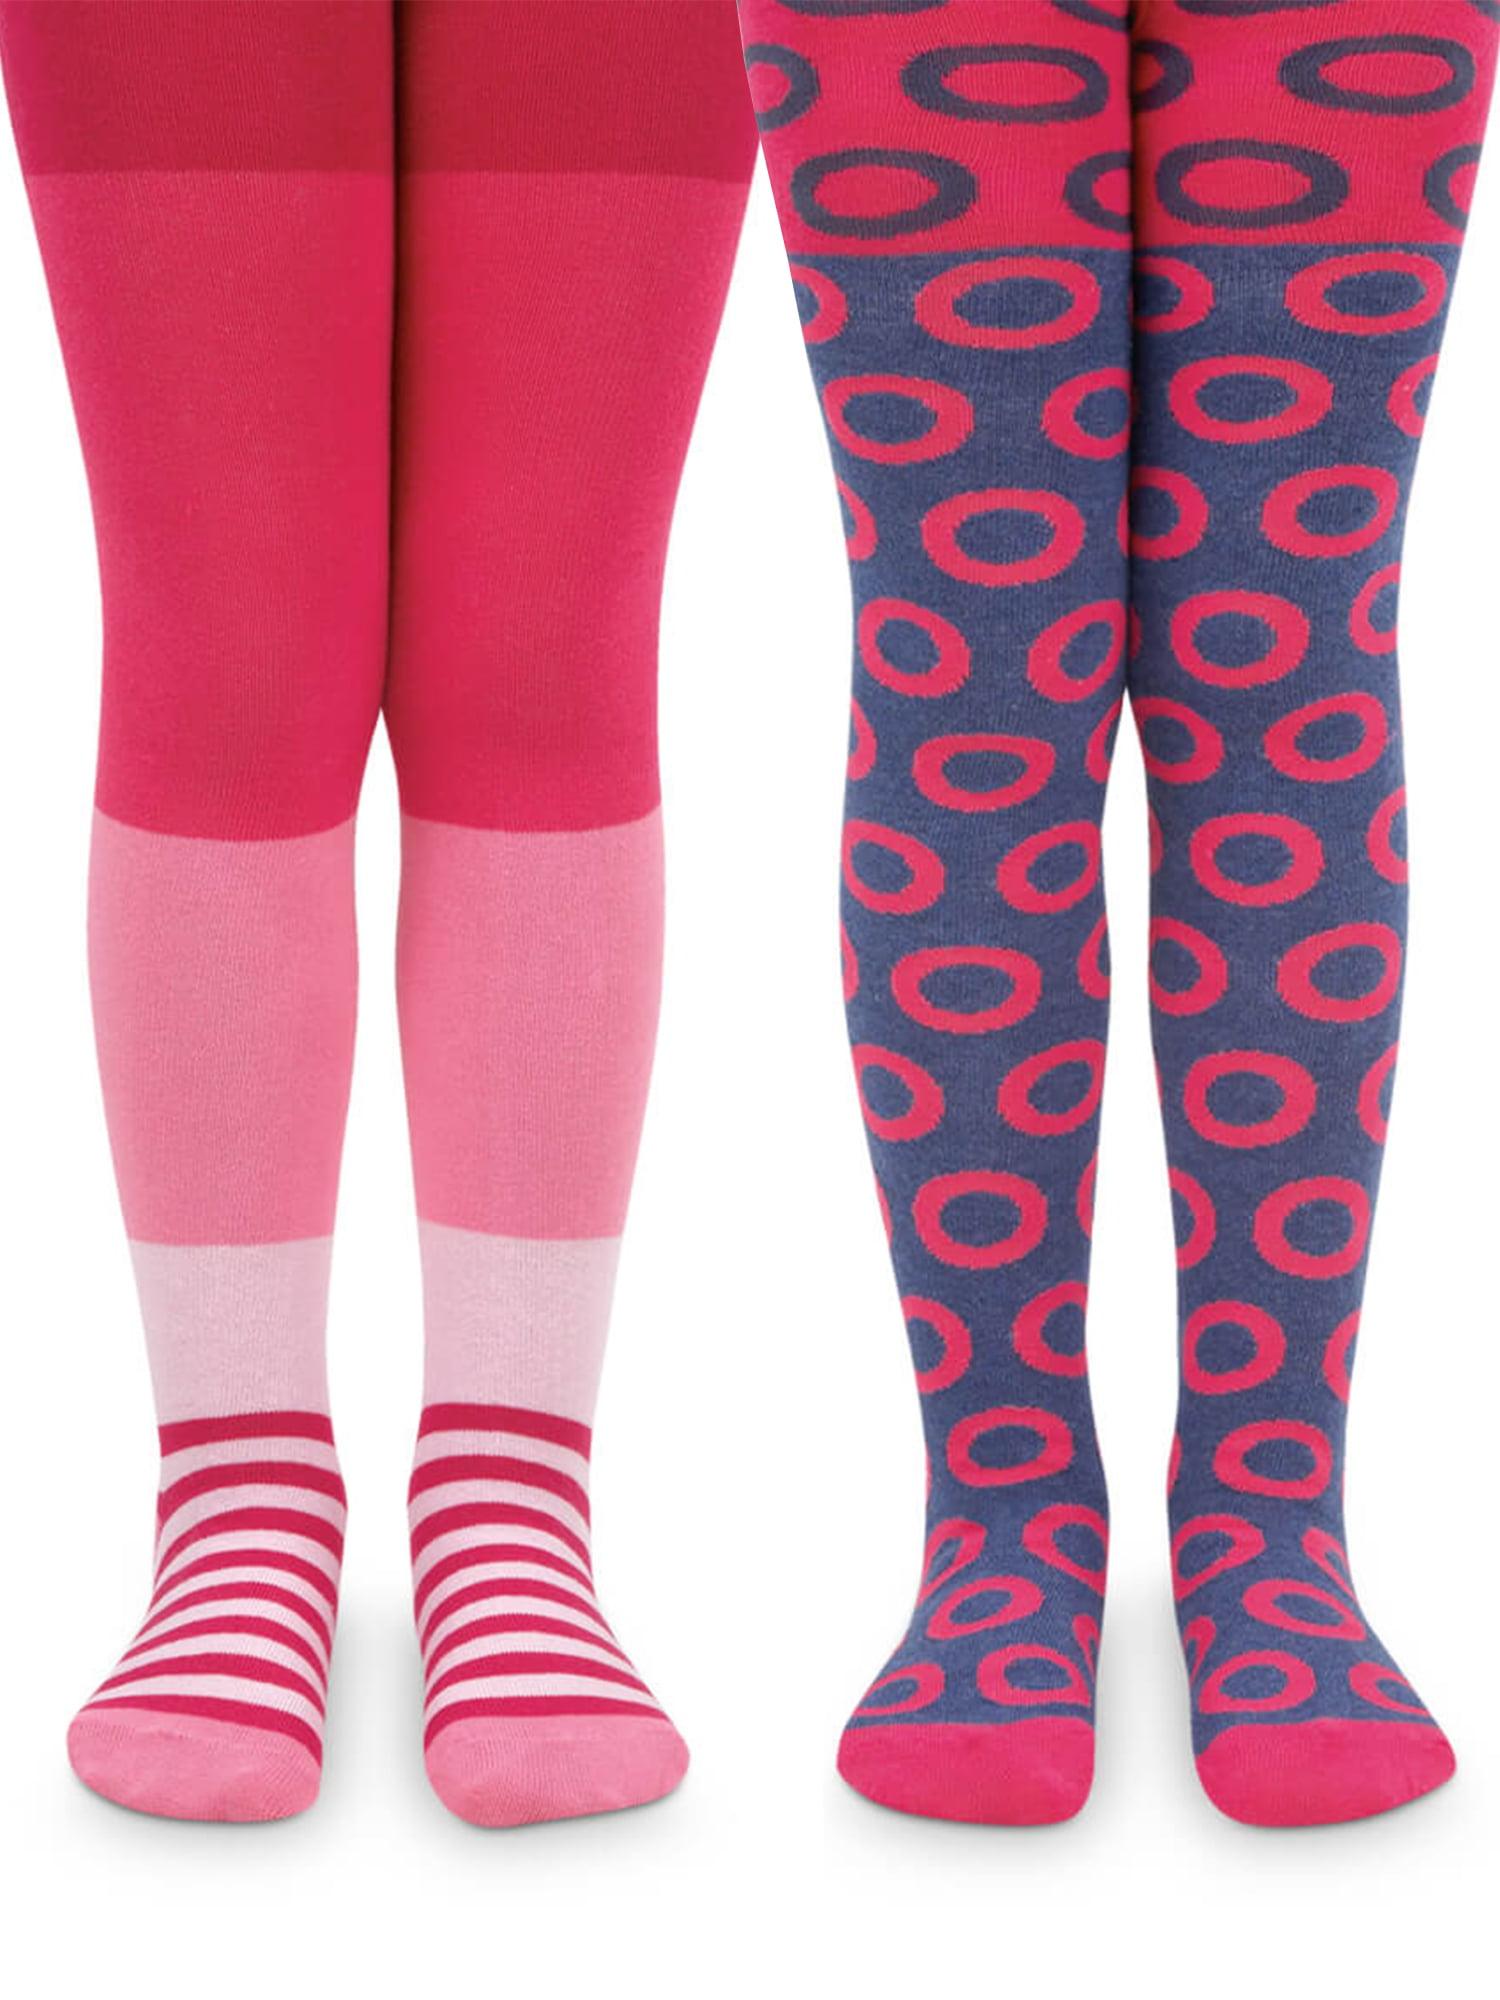 Ladies 5 Pack Socks Stripes Design Dots Black Socks Flowers Cotton Rich Size 4-8